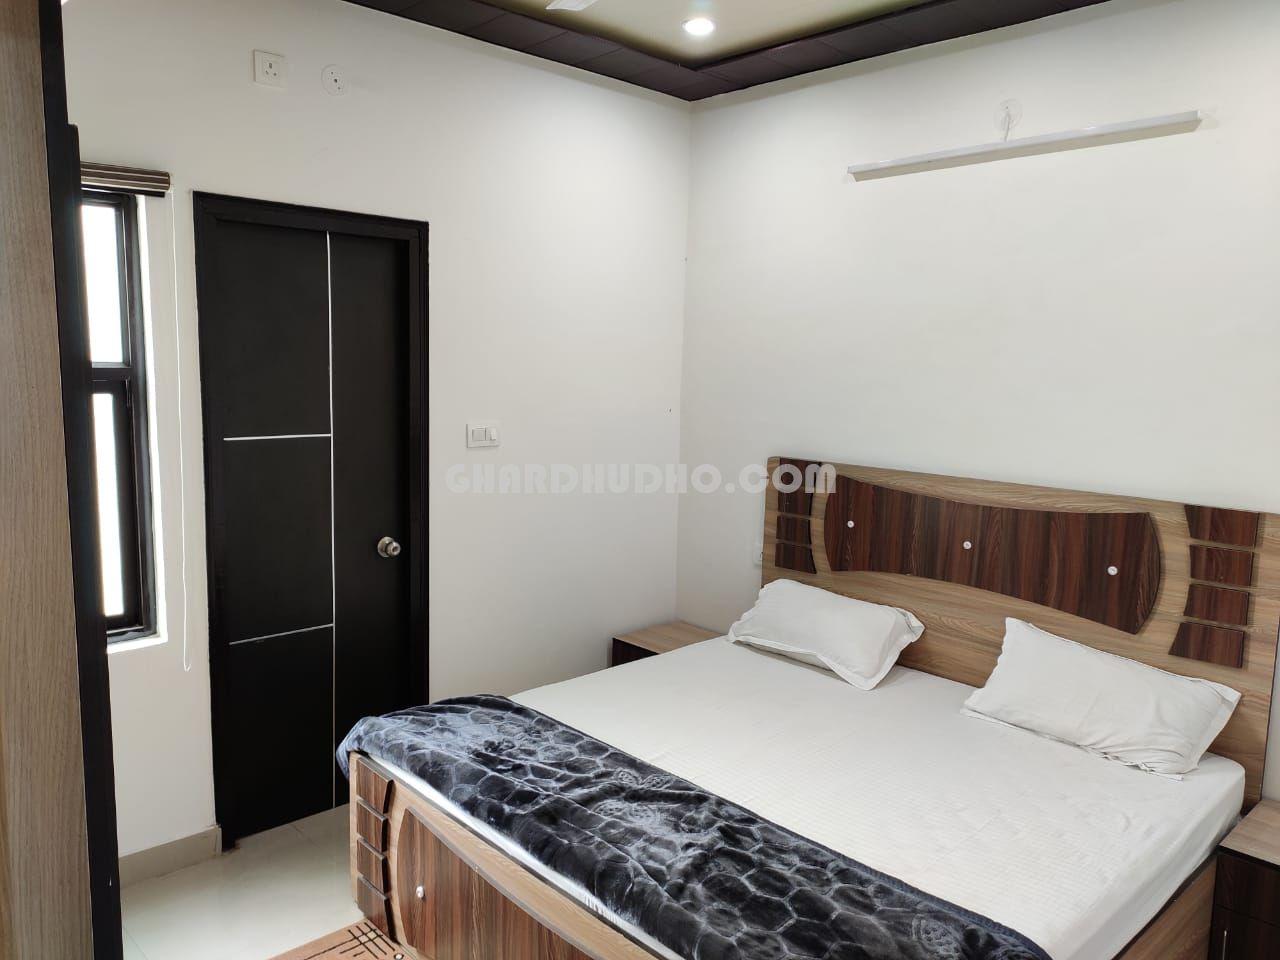 Lotus Garden Homes - 2/3 BHK Apartments